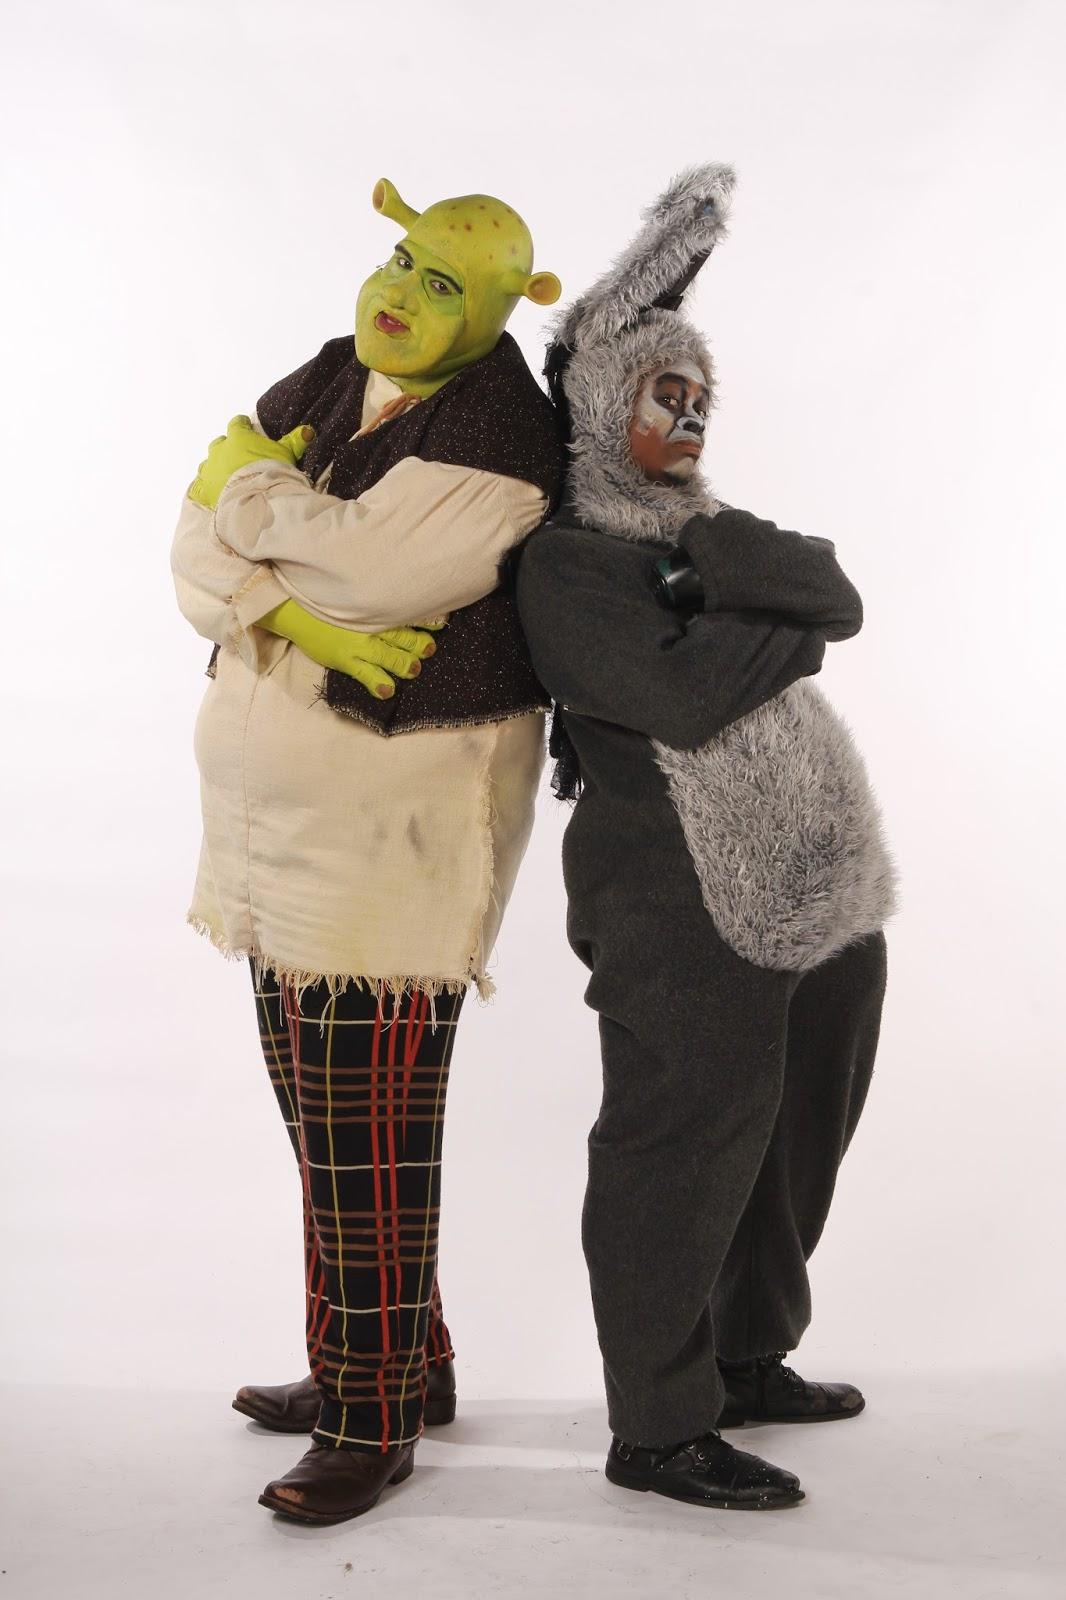 Shrek Mercury Summer Stock  sc 1 st  Rave and Pan & Rave and Pan: Shrek Mercury Summer Stock